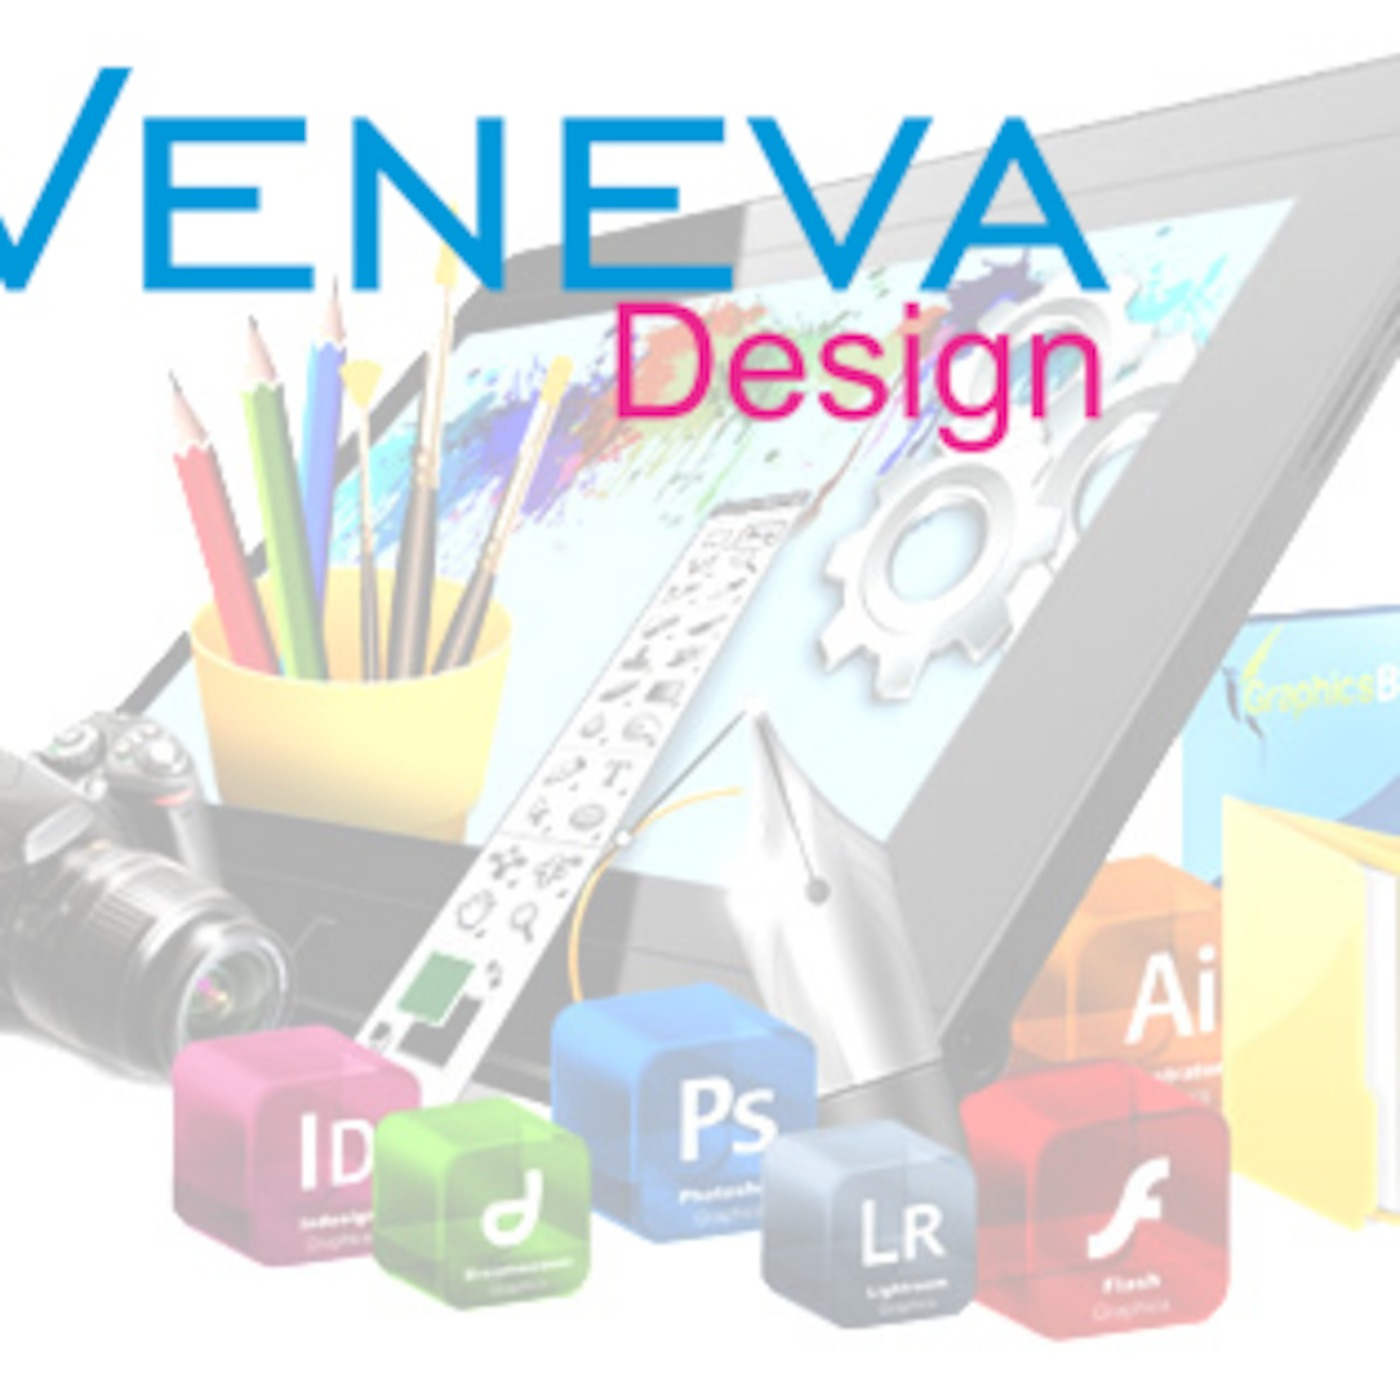 Veneva Design